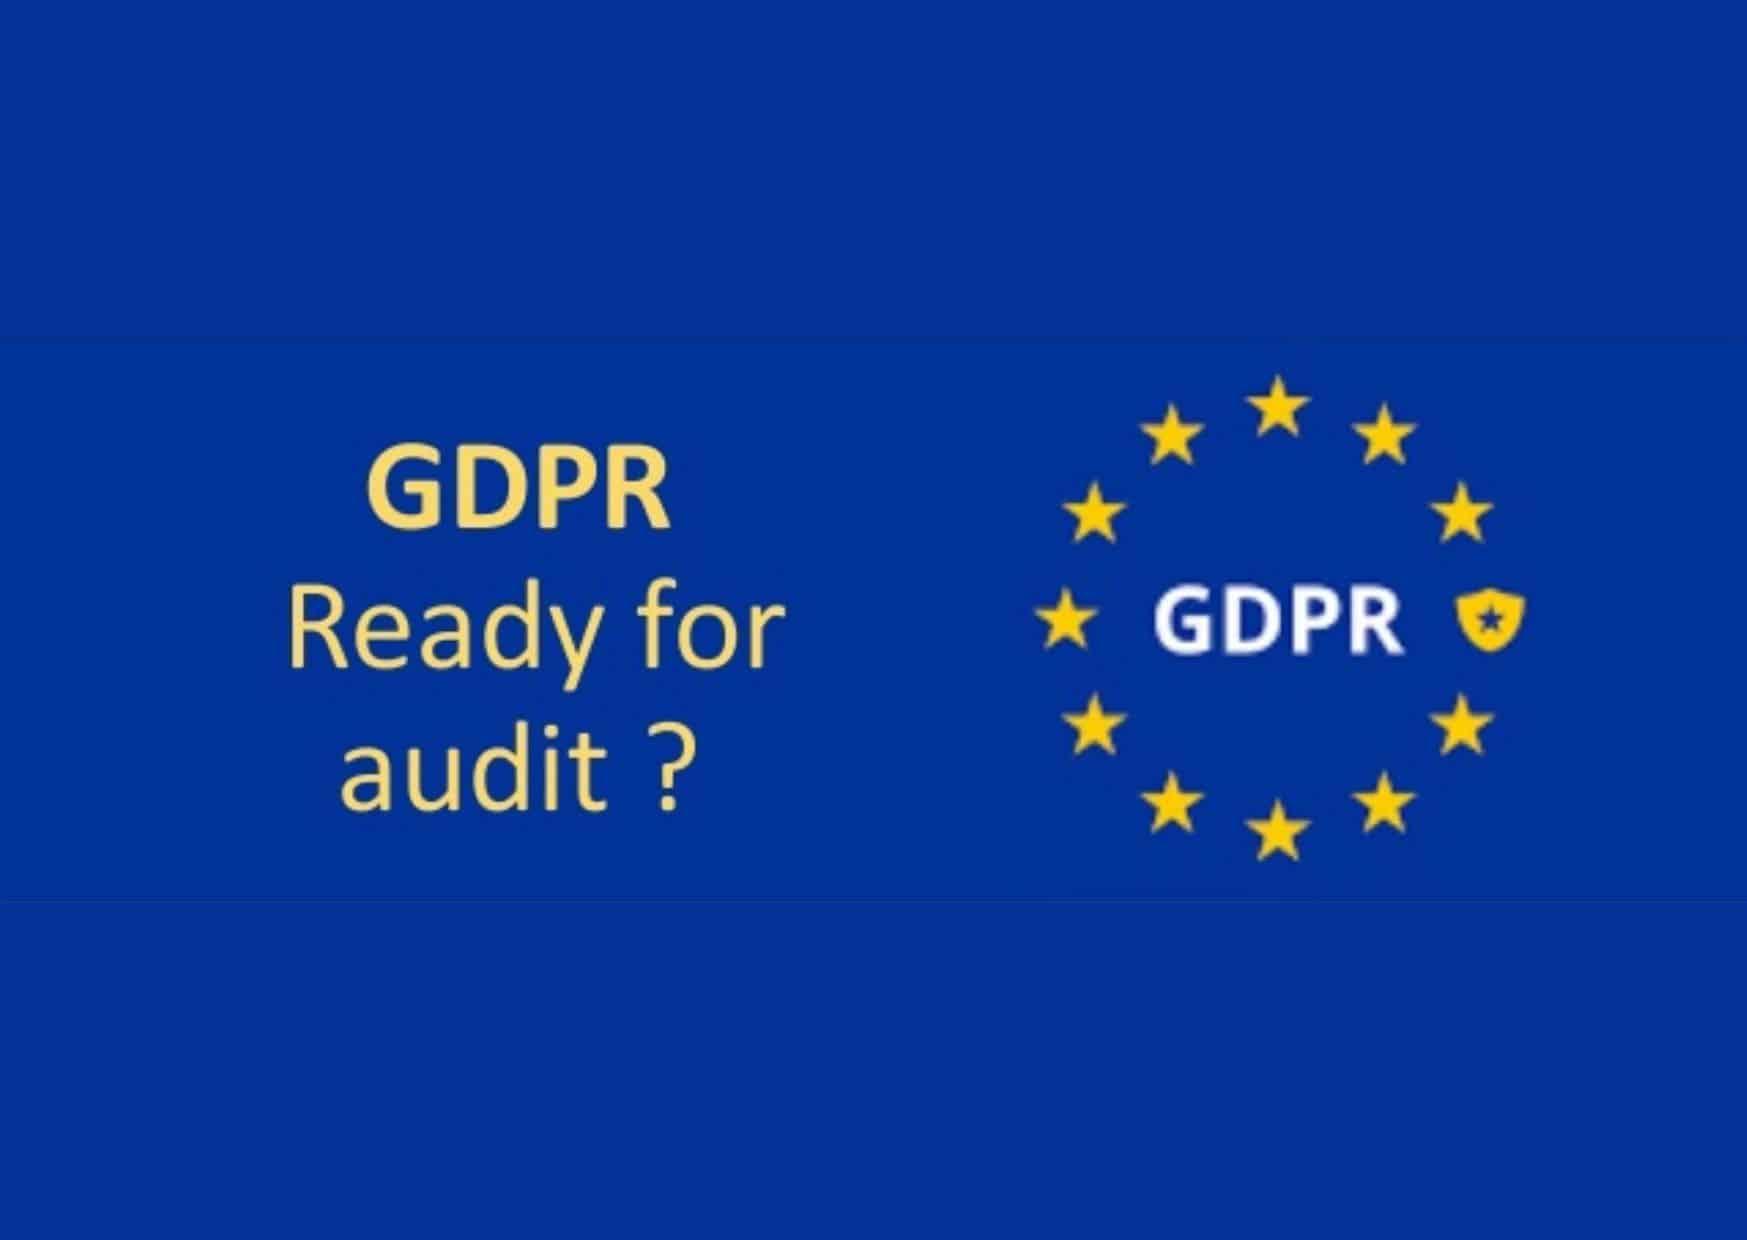 gdpr-auditing